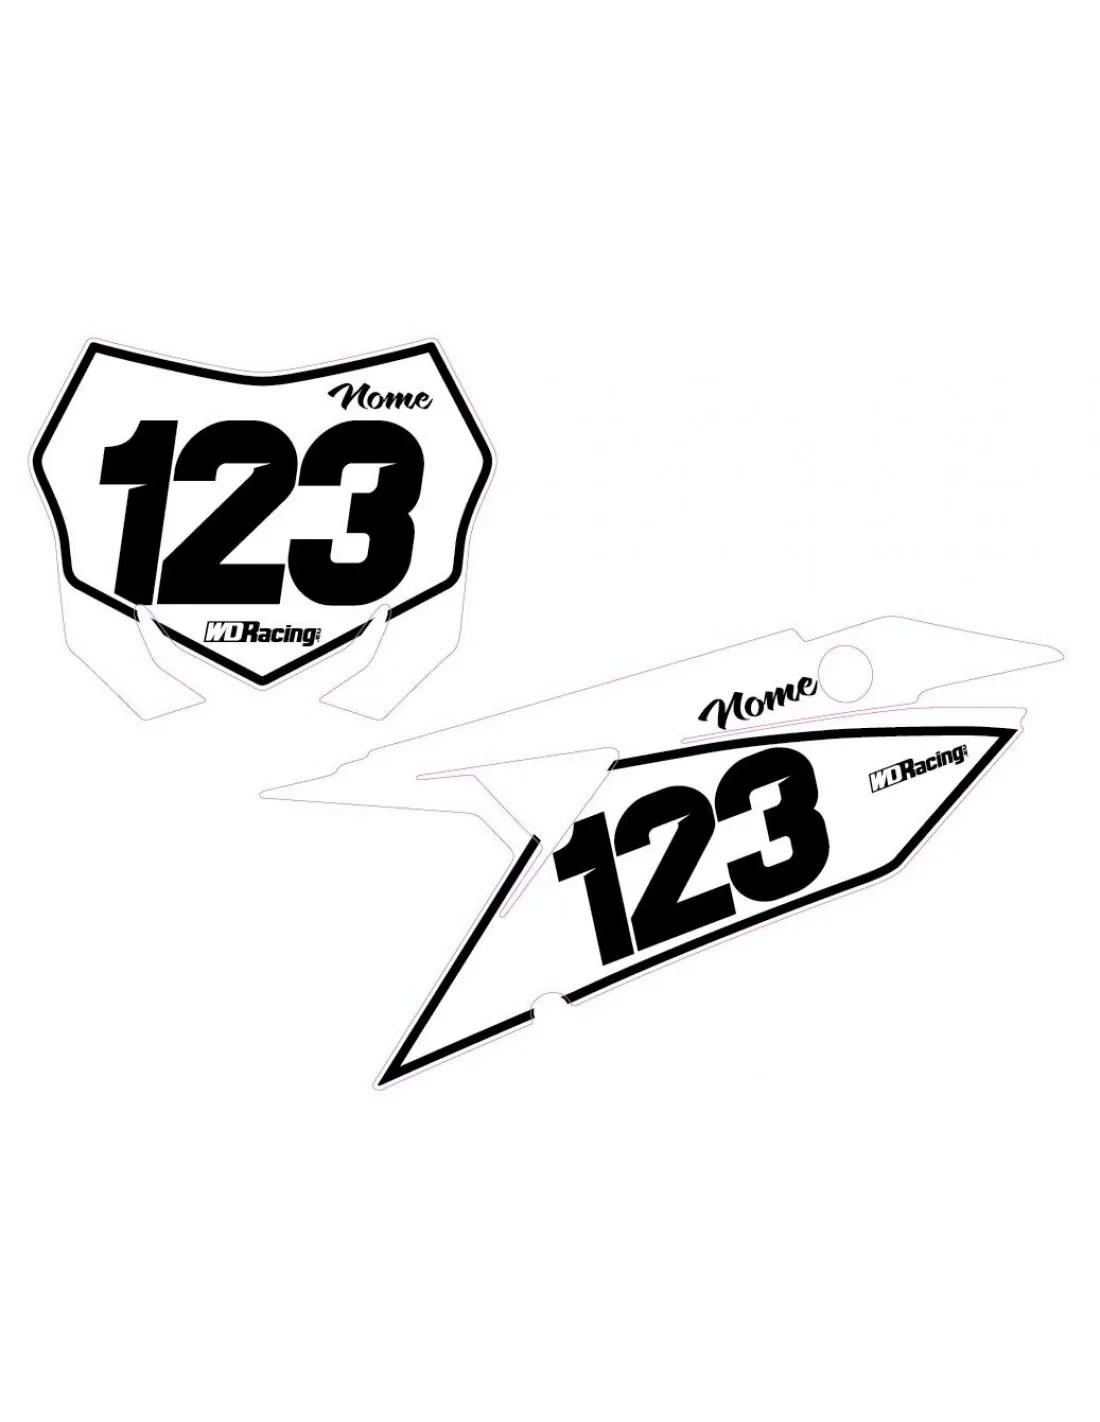 Tabelle Base Suzuki RMZ RMZ DRZ